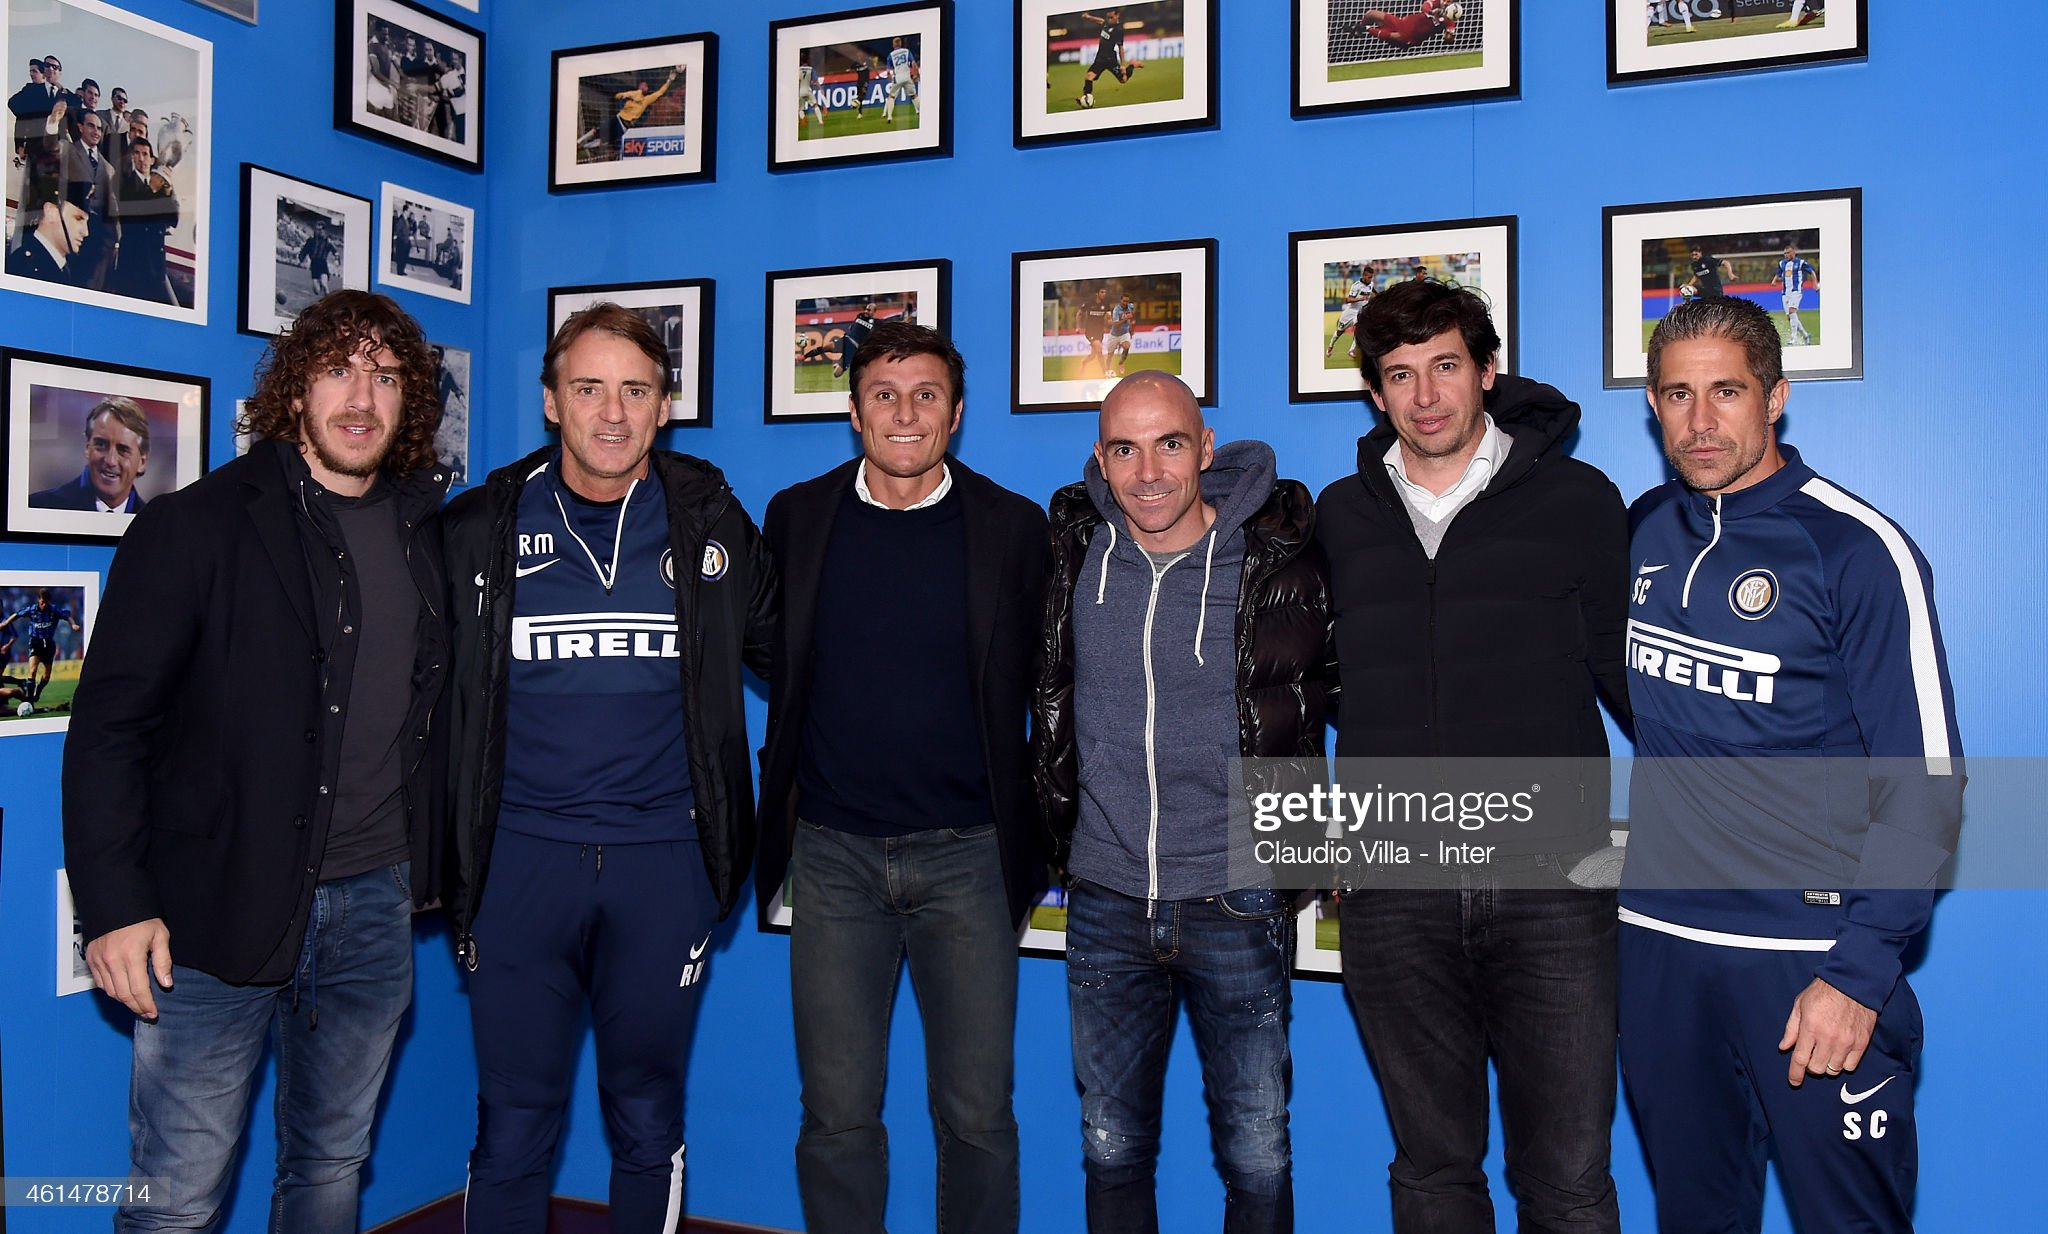 ¿Cuánto mide Carles Puyol? - Altura - Real height - Página 4 Carles-puyol-roberto-mancini-javier-zanetti-ivan-de-la-pena-demetrio-picture-id461478714?s=2048x2048